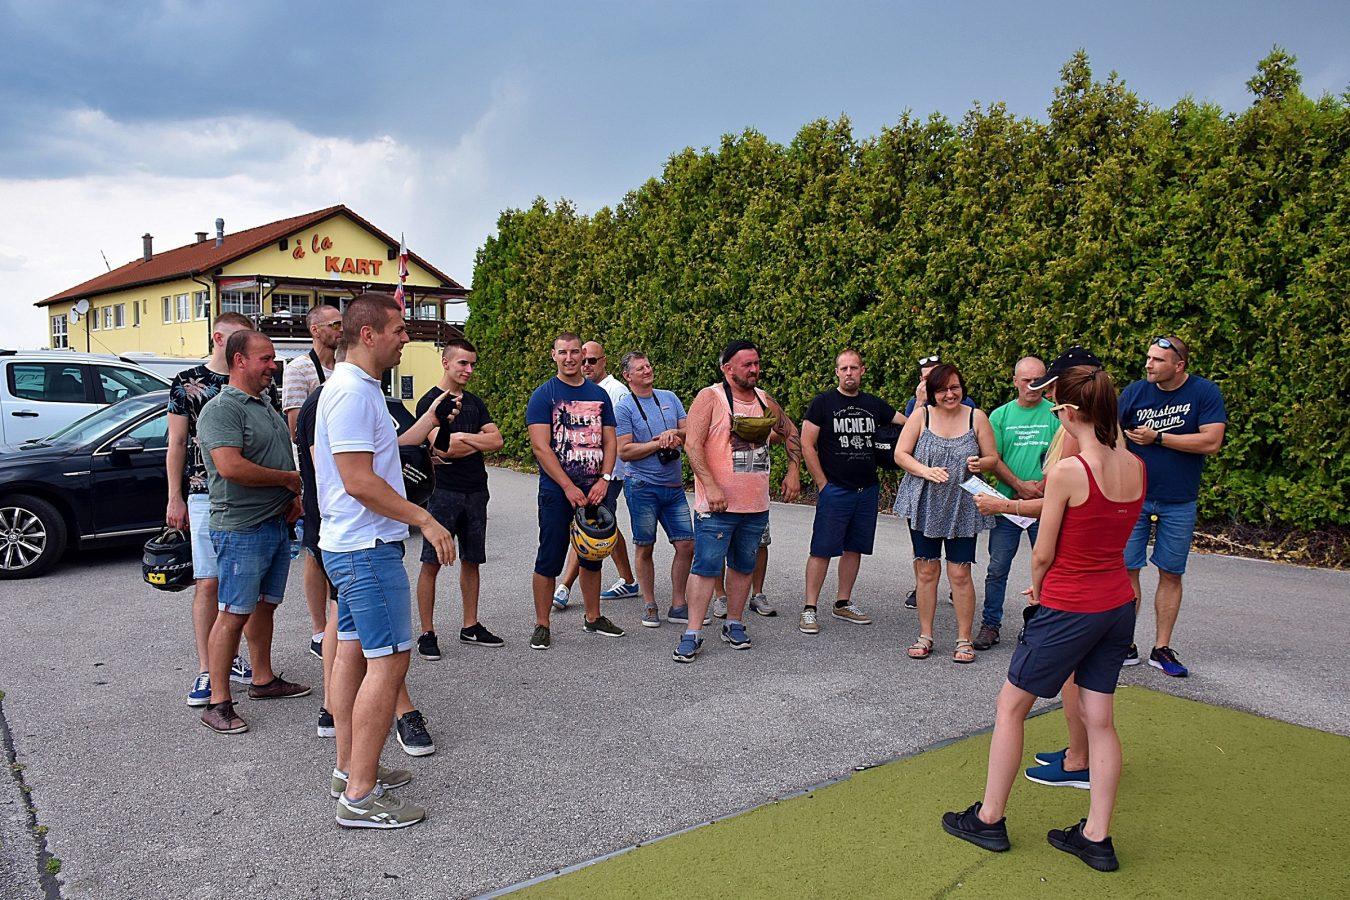 Team Buliding in Pachtfurt 7